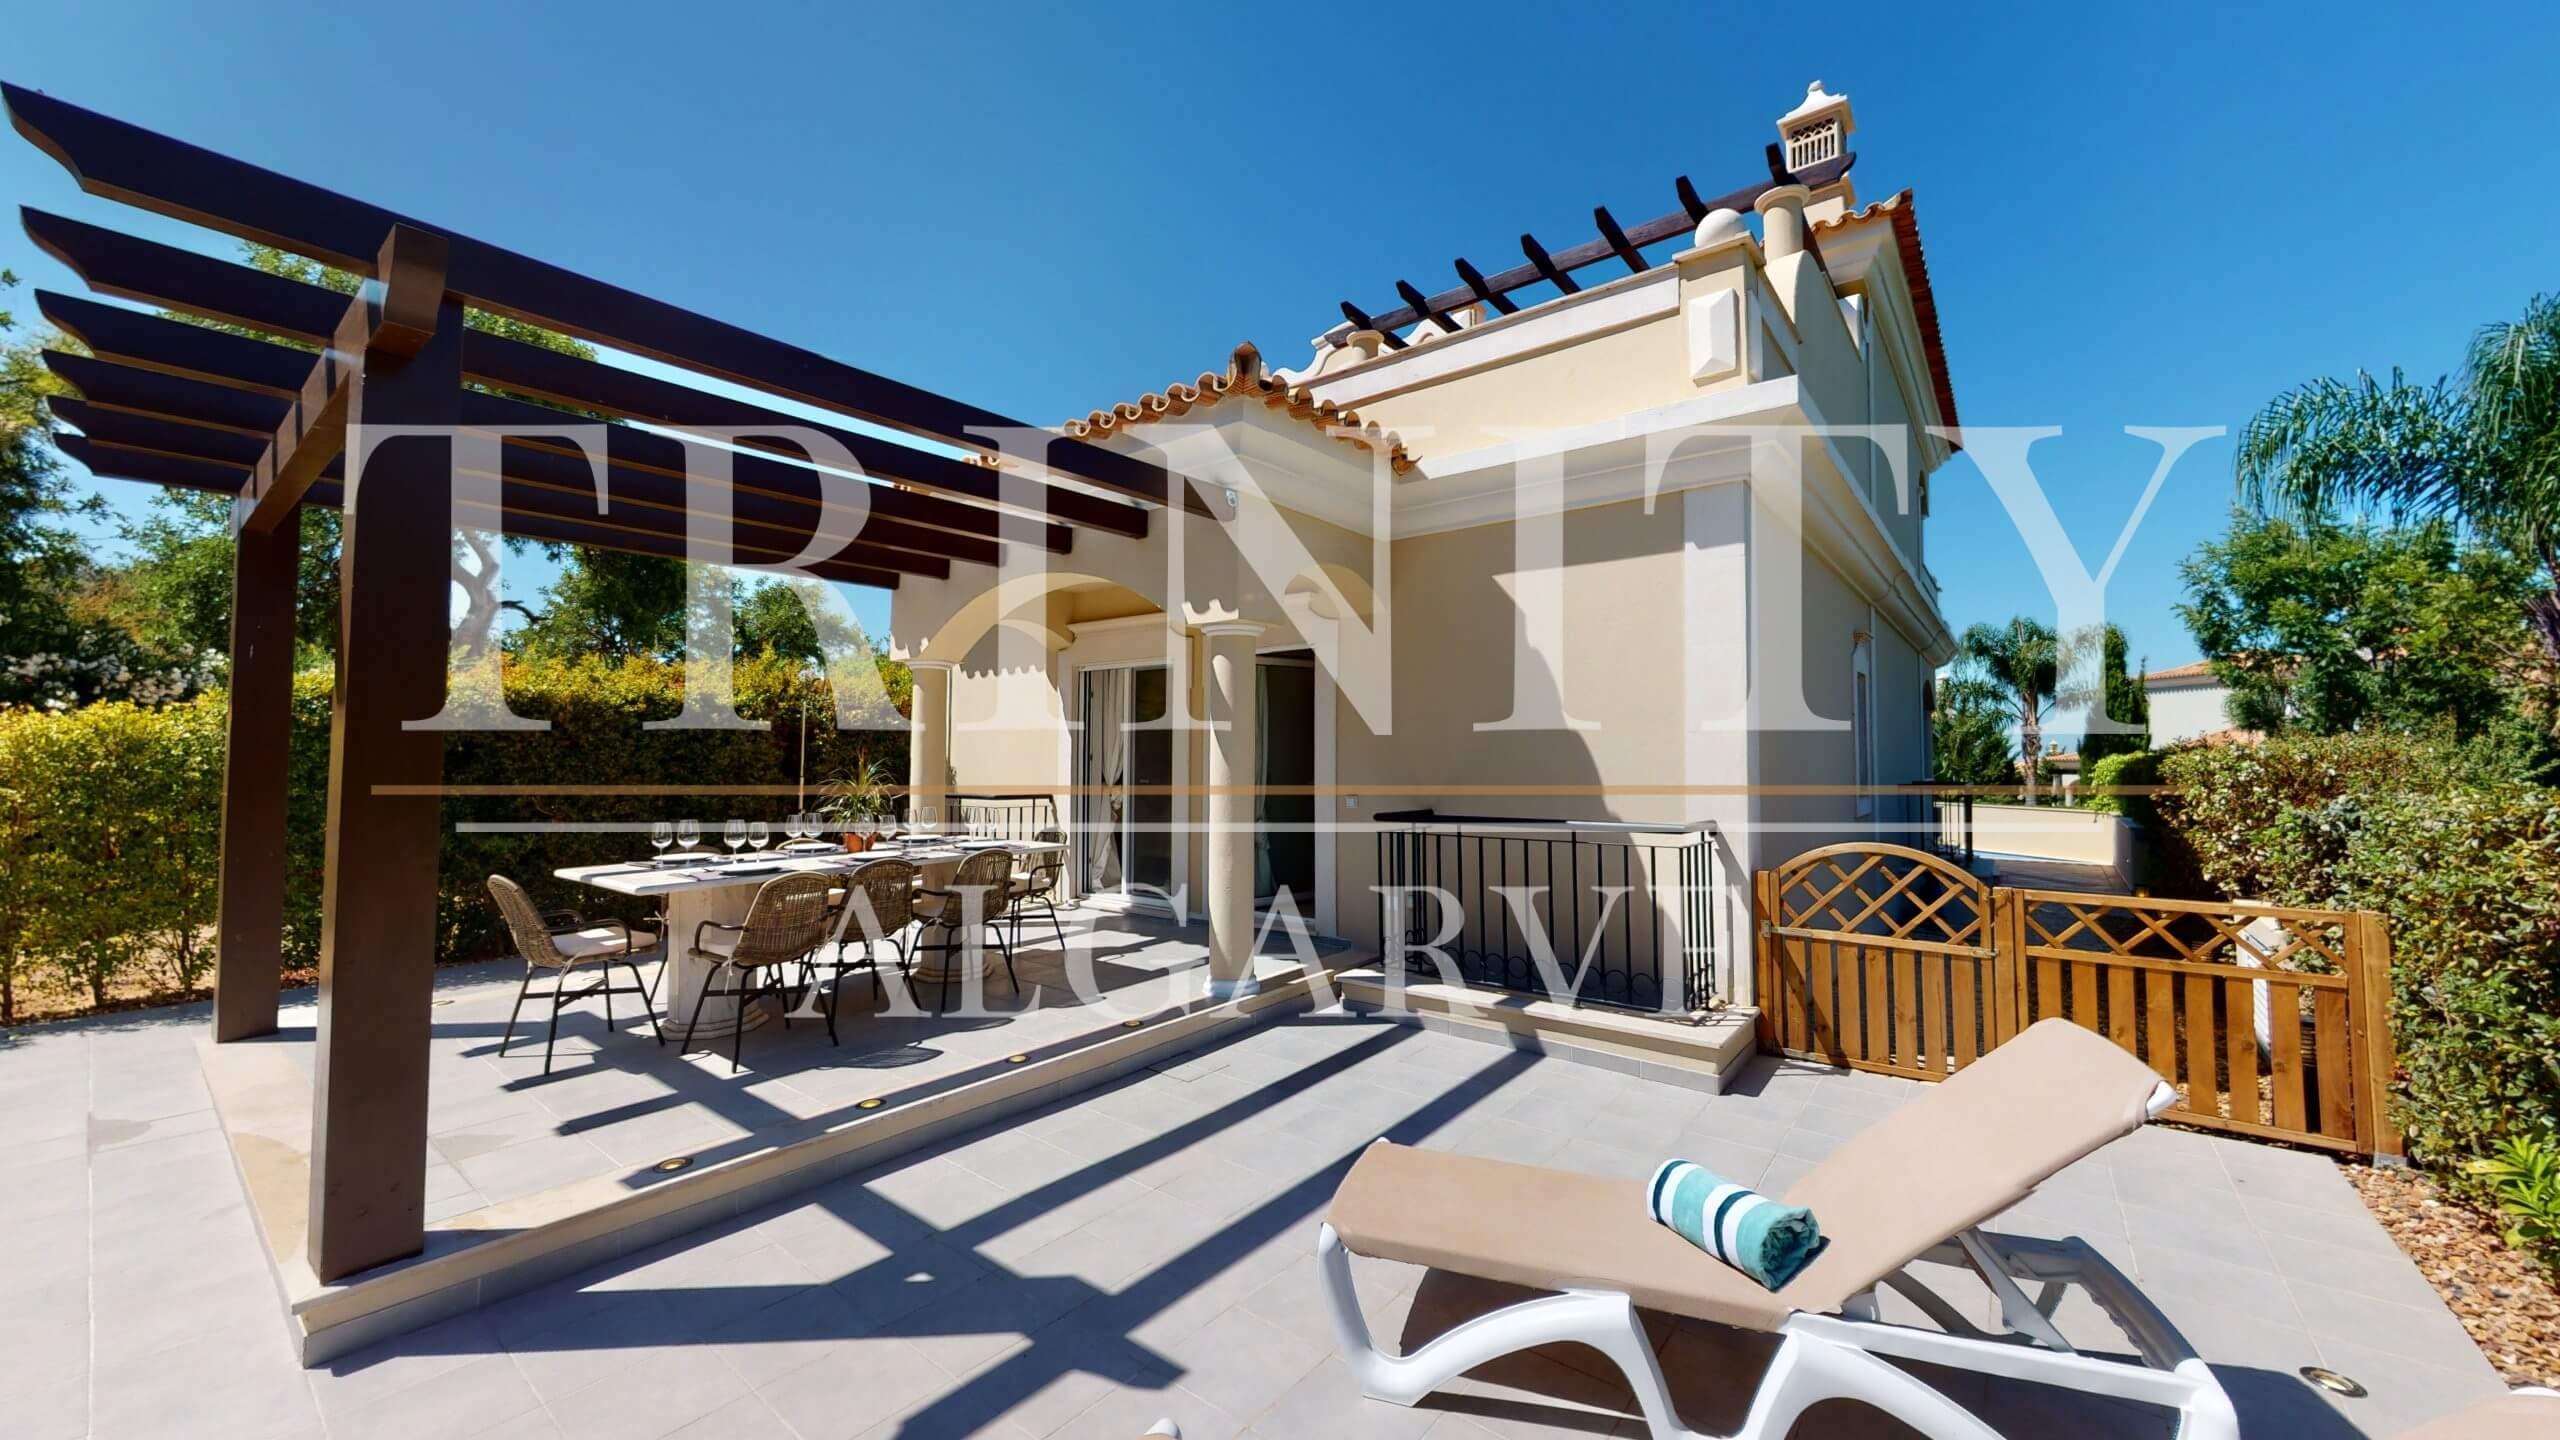 35-The-Crest-by-Trinity-Algarve-07032020_113252